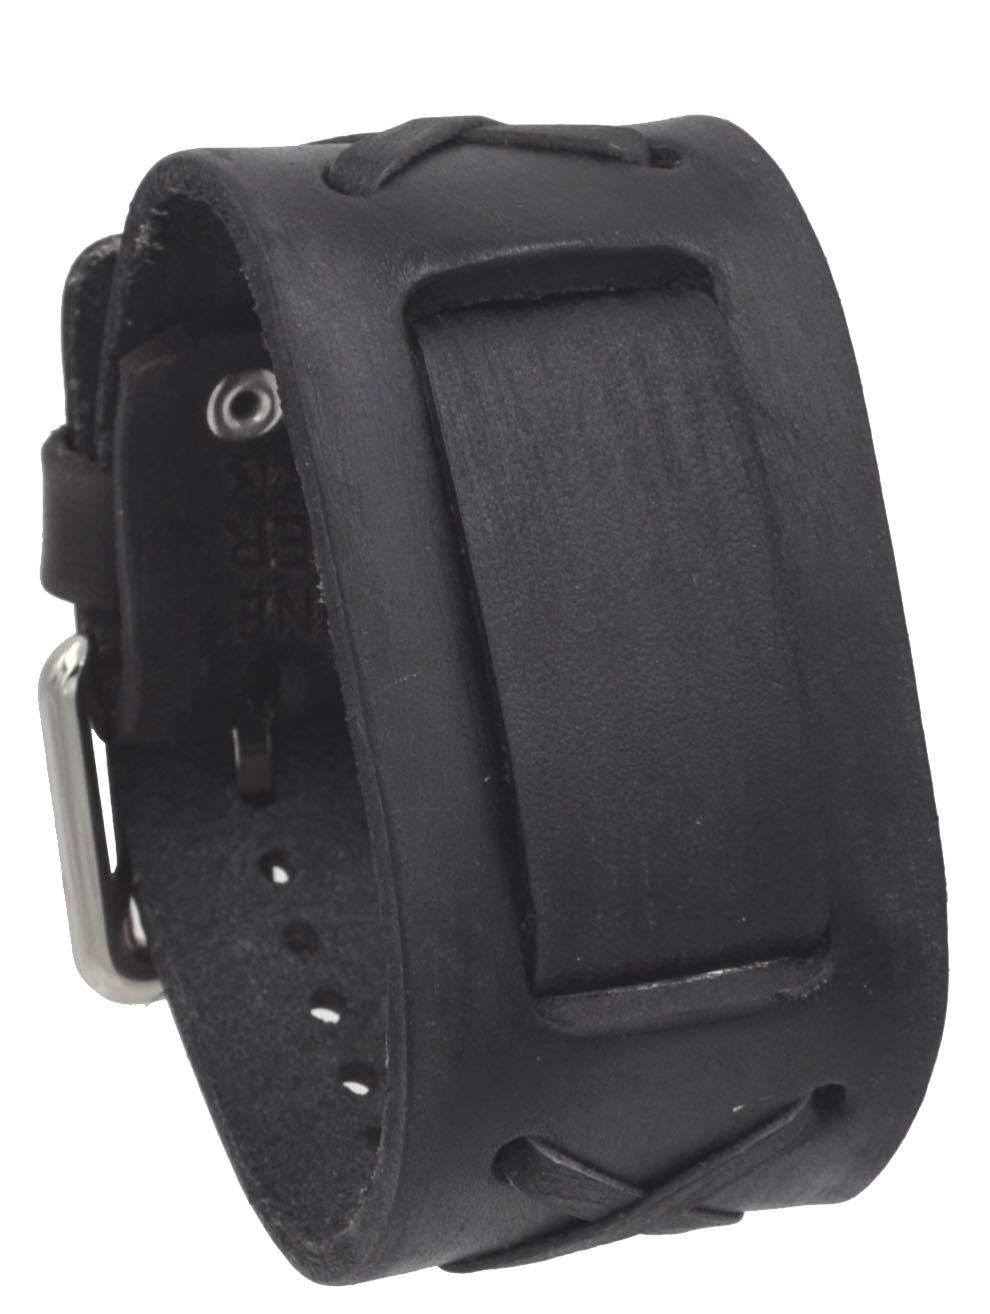 Nemesis #FXB-KK Charcoal 39mm Wide 20mm Lug Width Wide Leather Watch Cuff Band by Nemesis